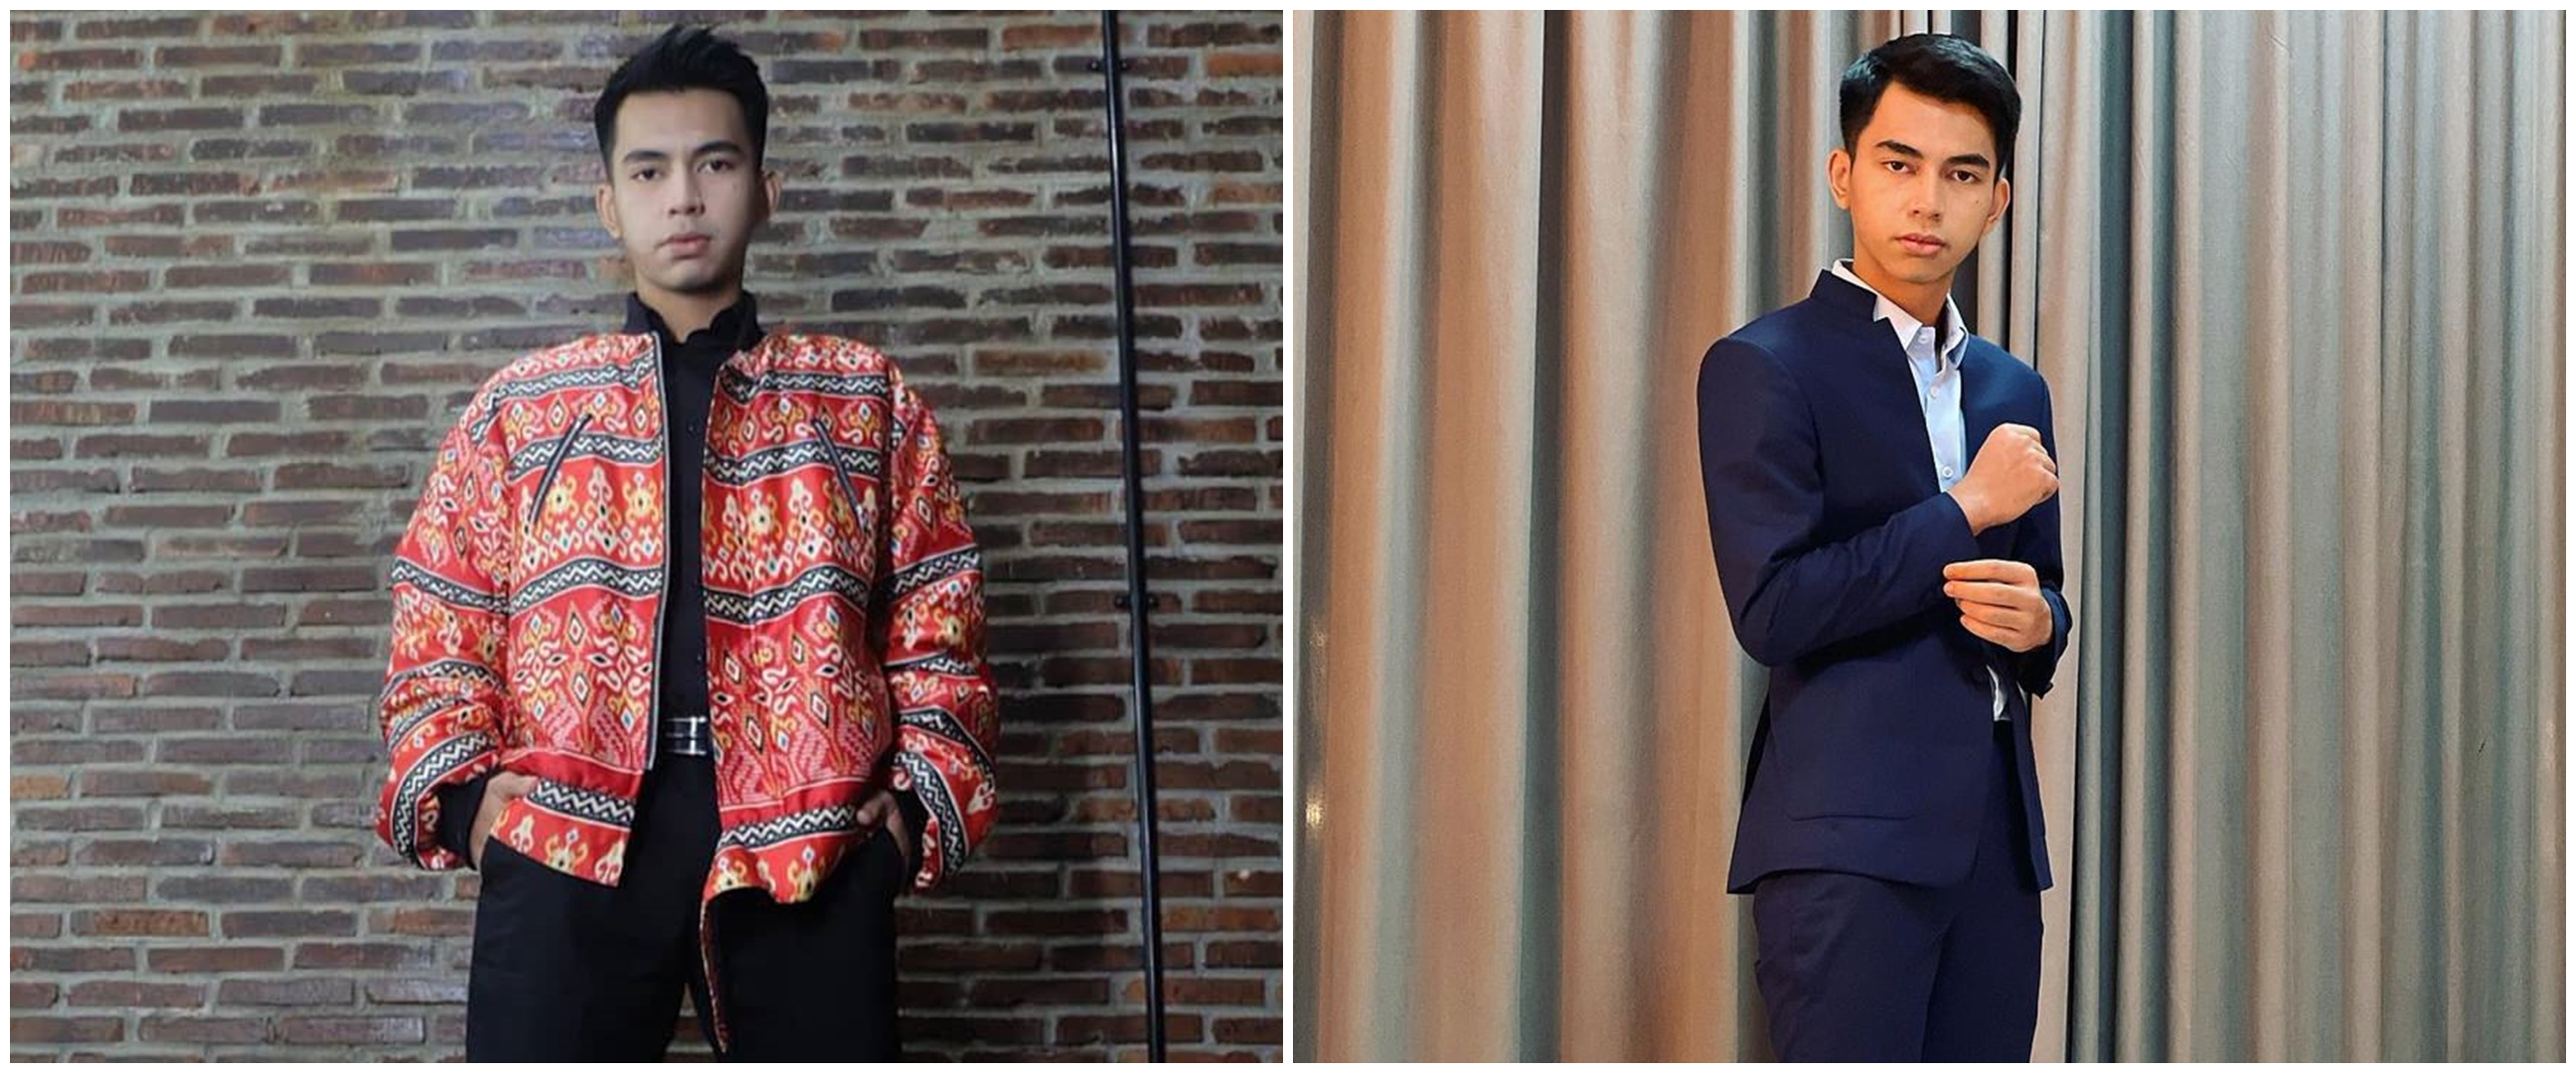 10 Taksiran harga fashion item Dimas Ahmad, jamnya bikin melongo